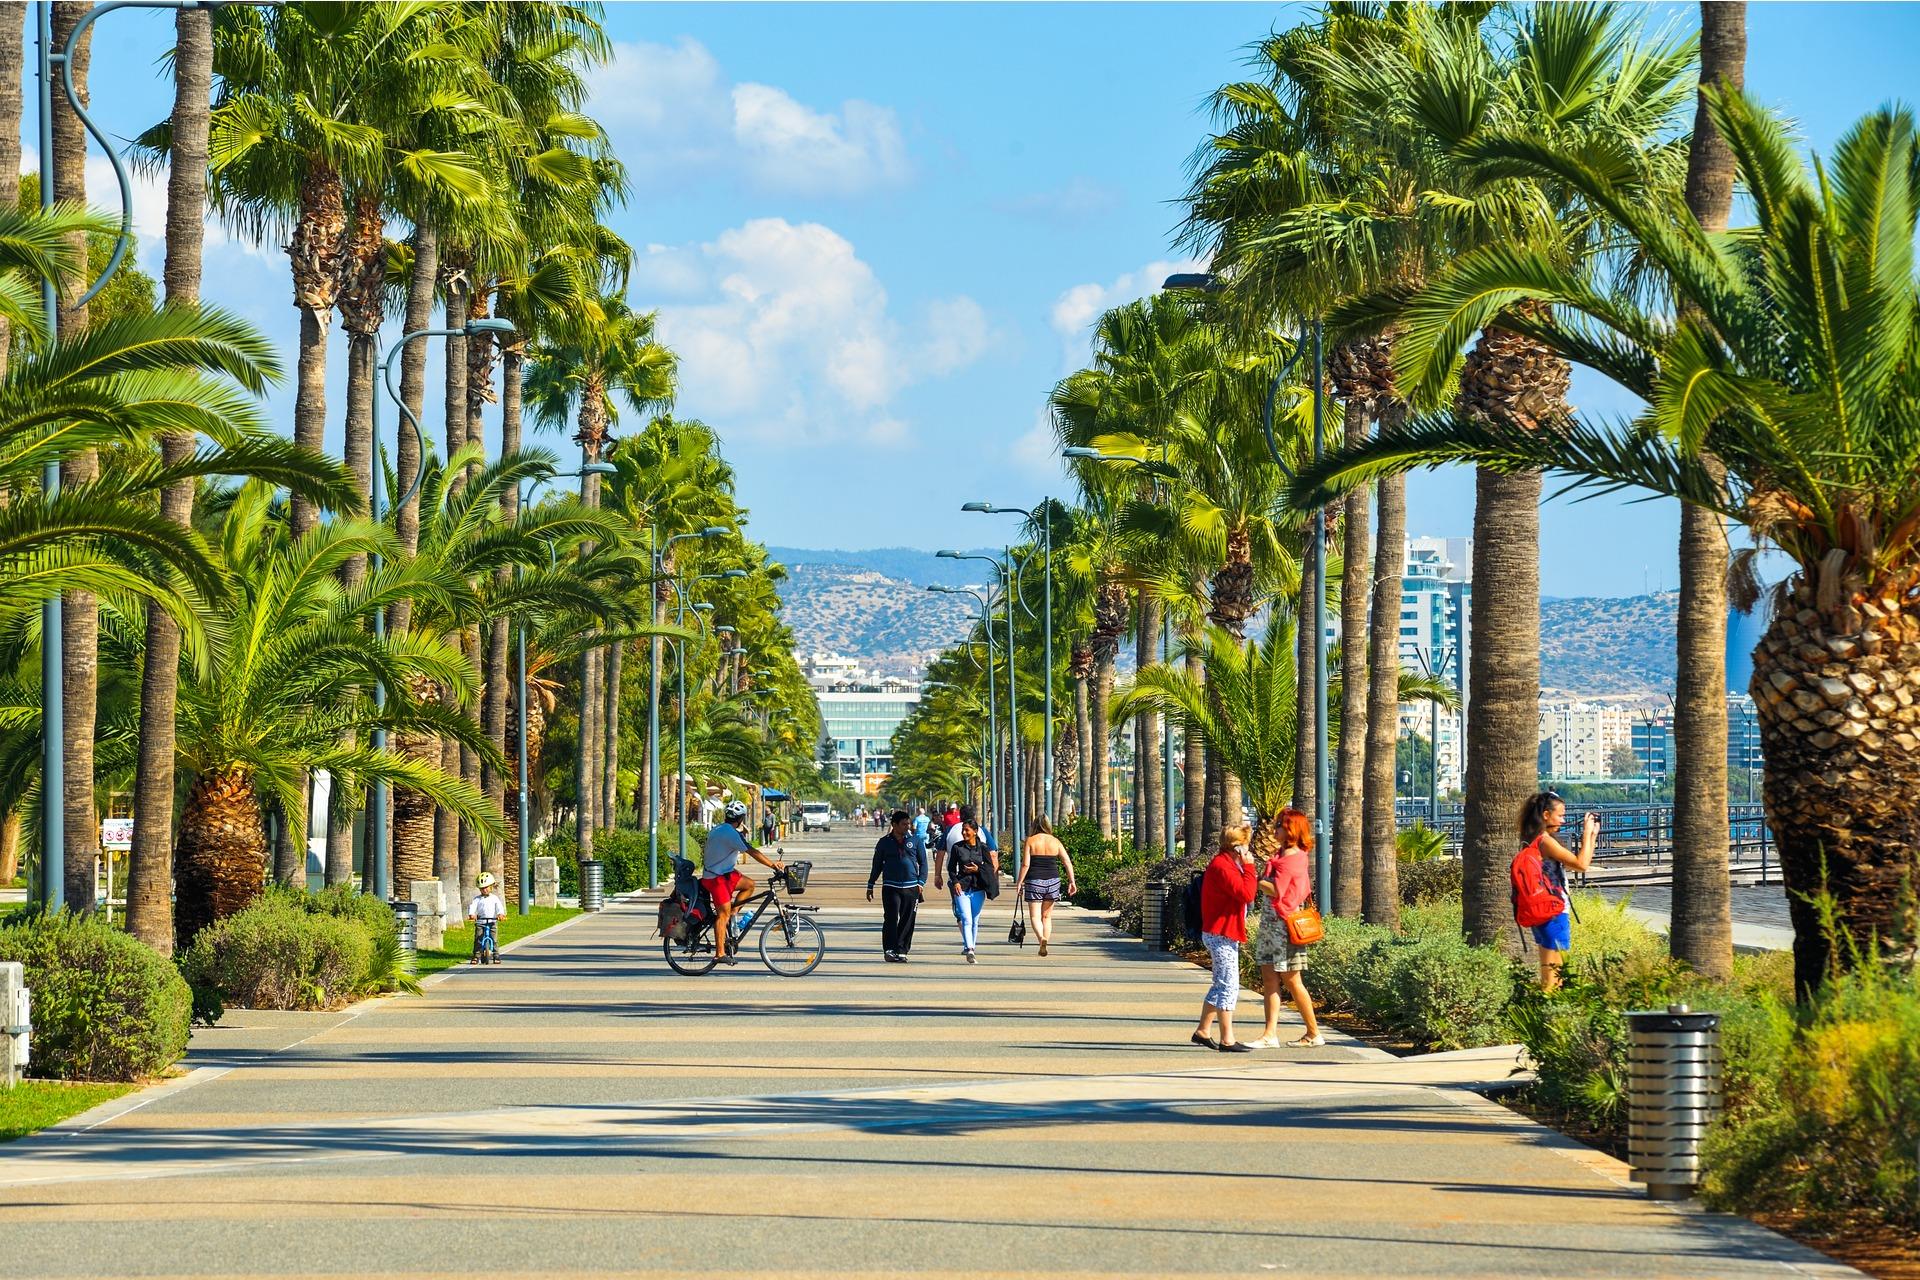 The Boardwalk in Limassol, Cyprus